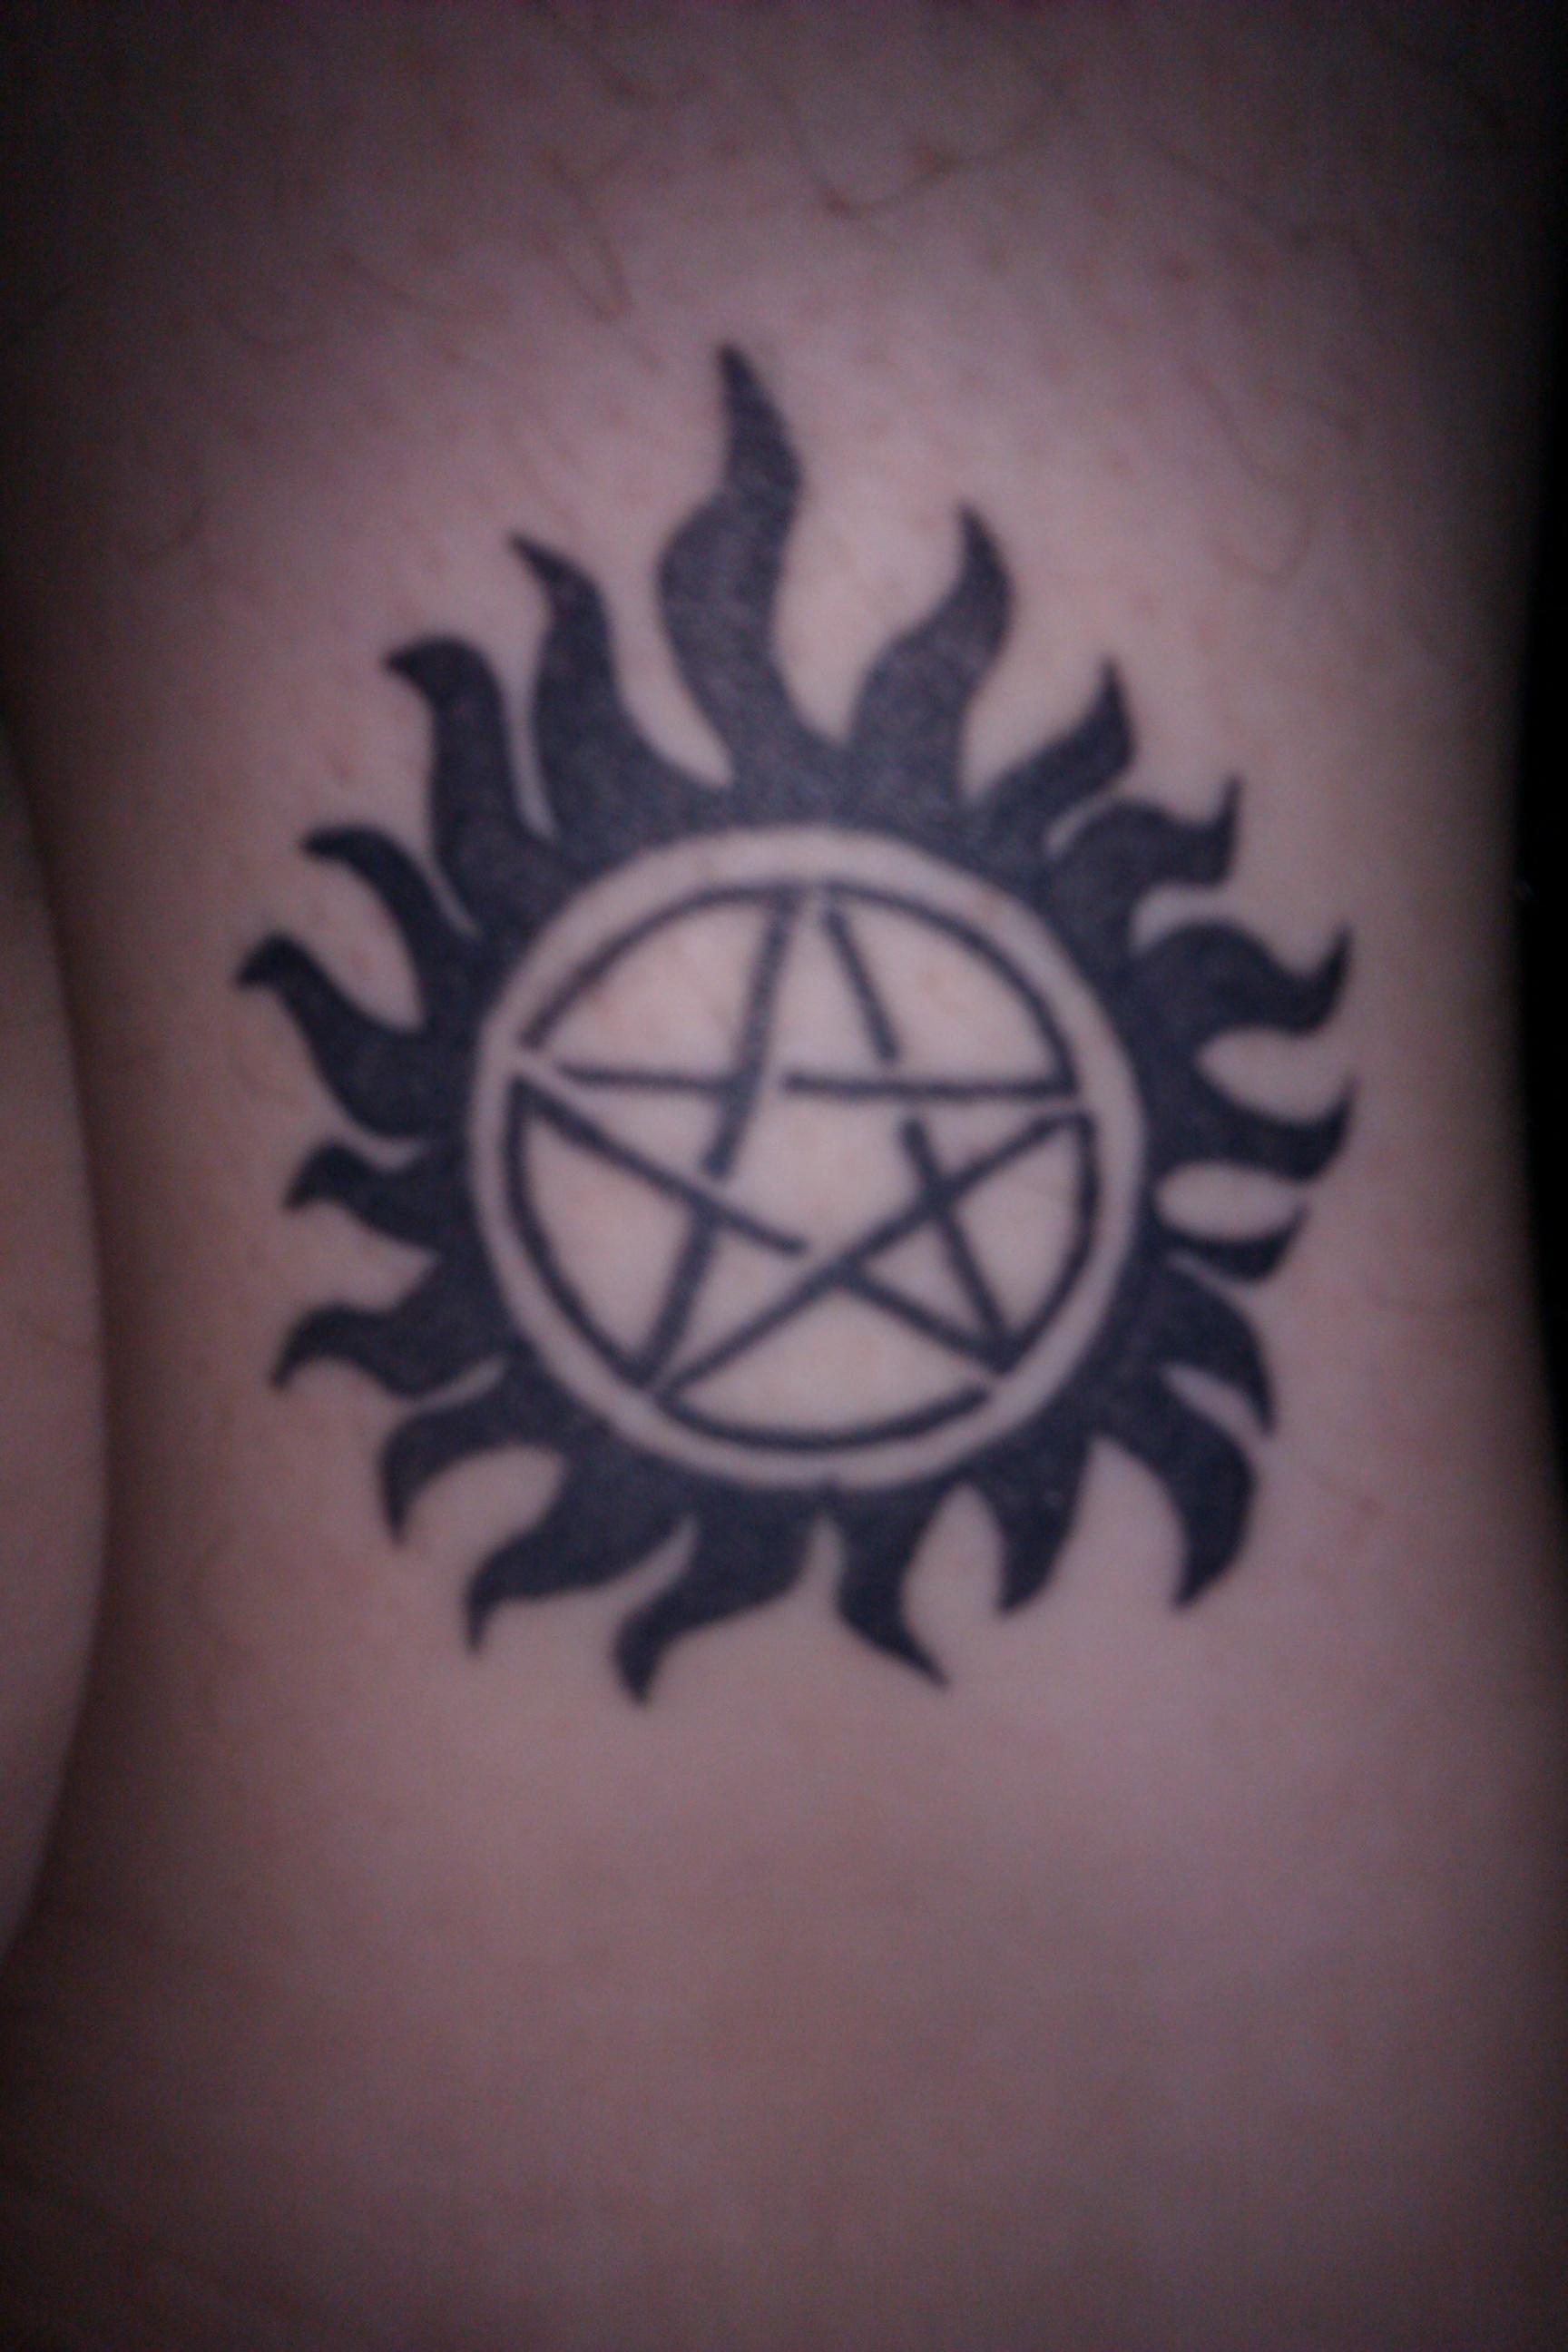 My Supernatural Tattoo by m-granell on DeviantArt